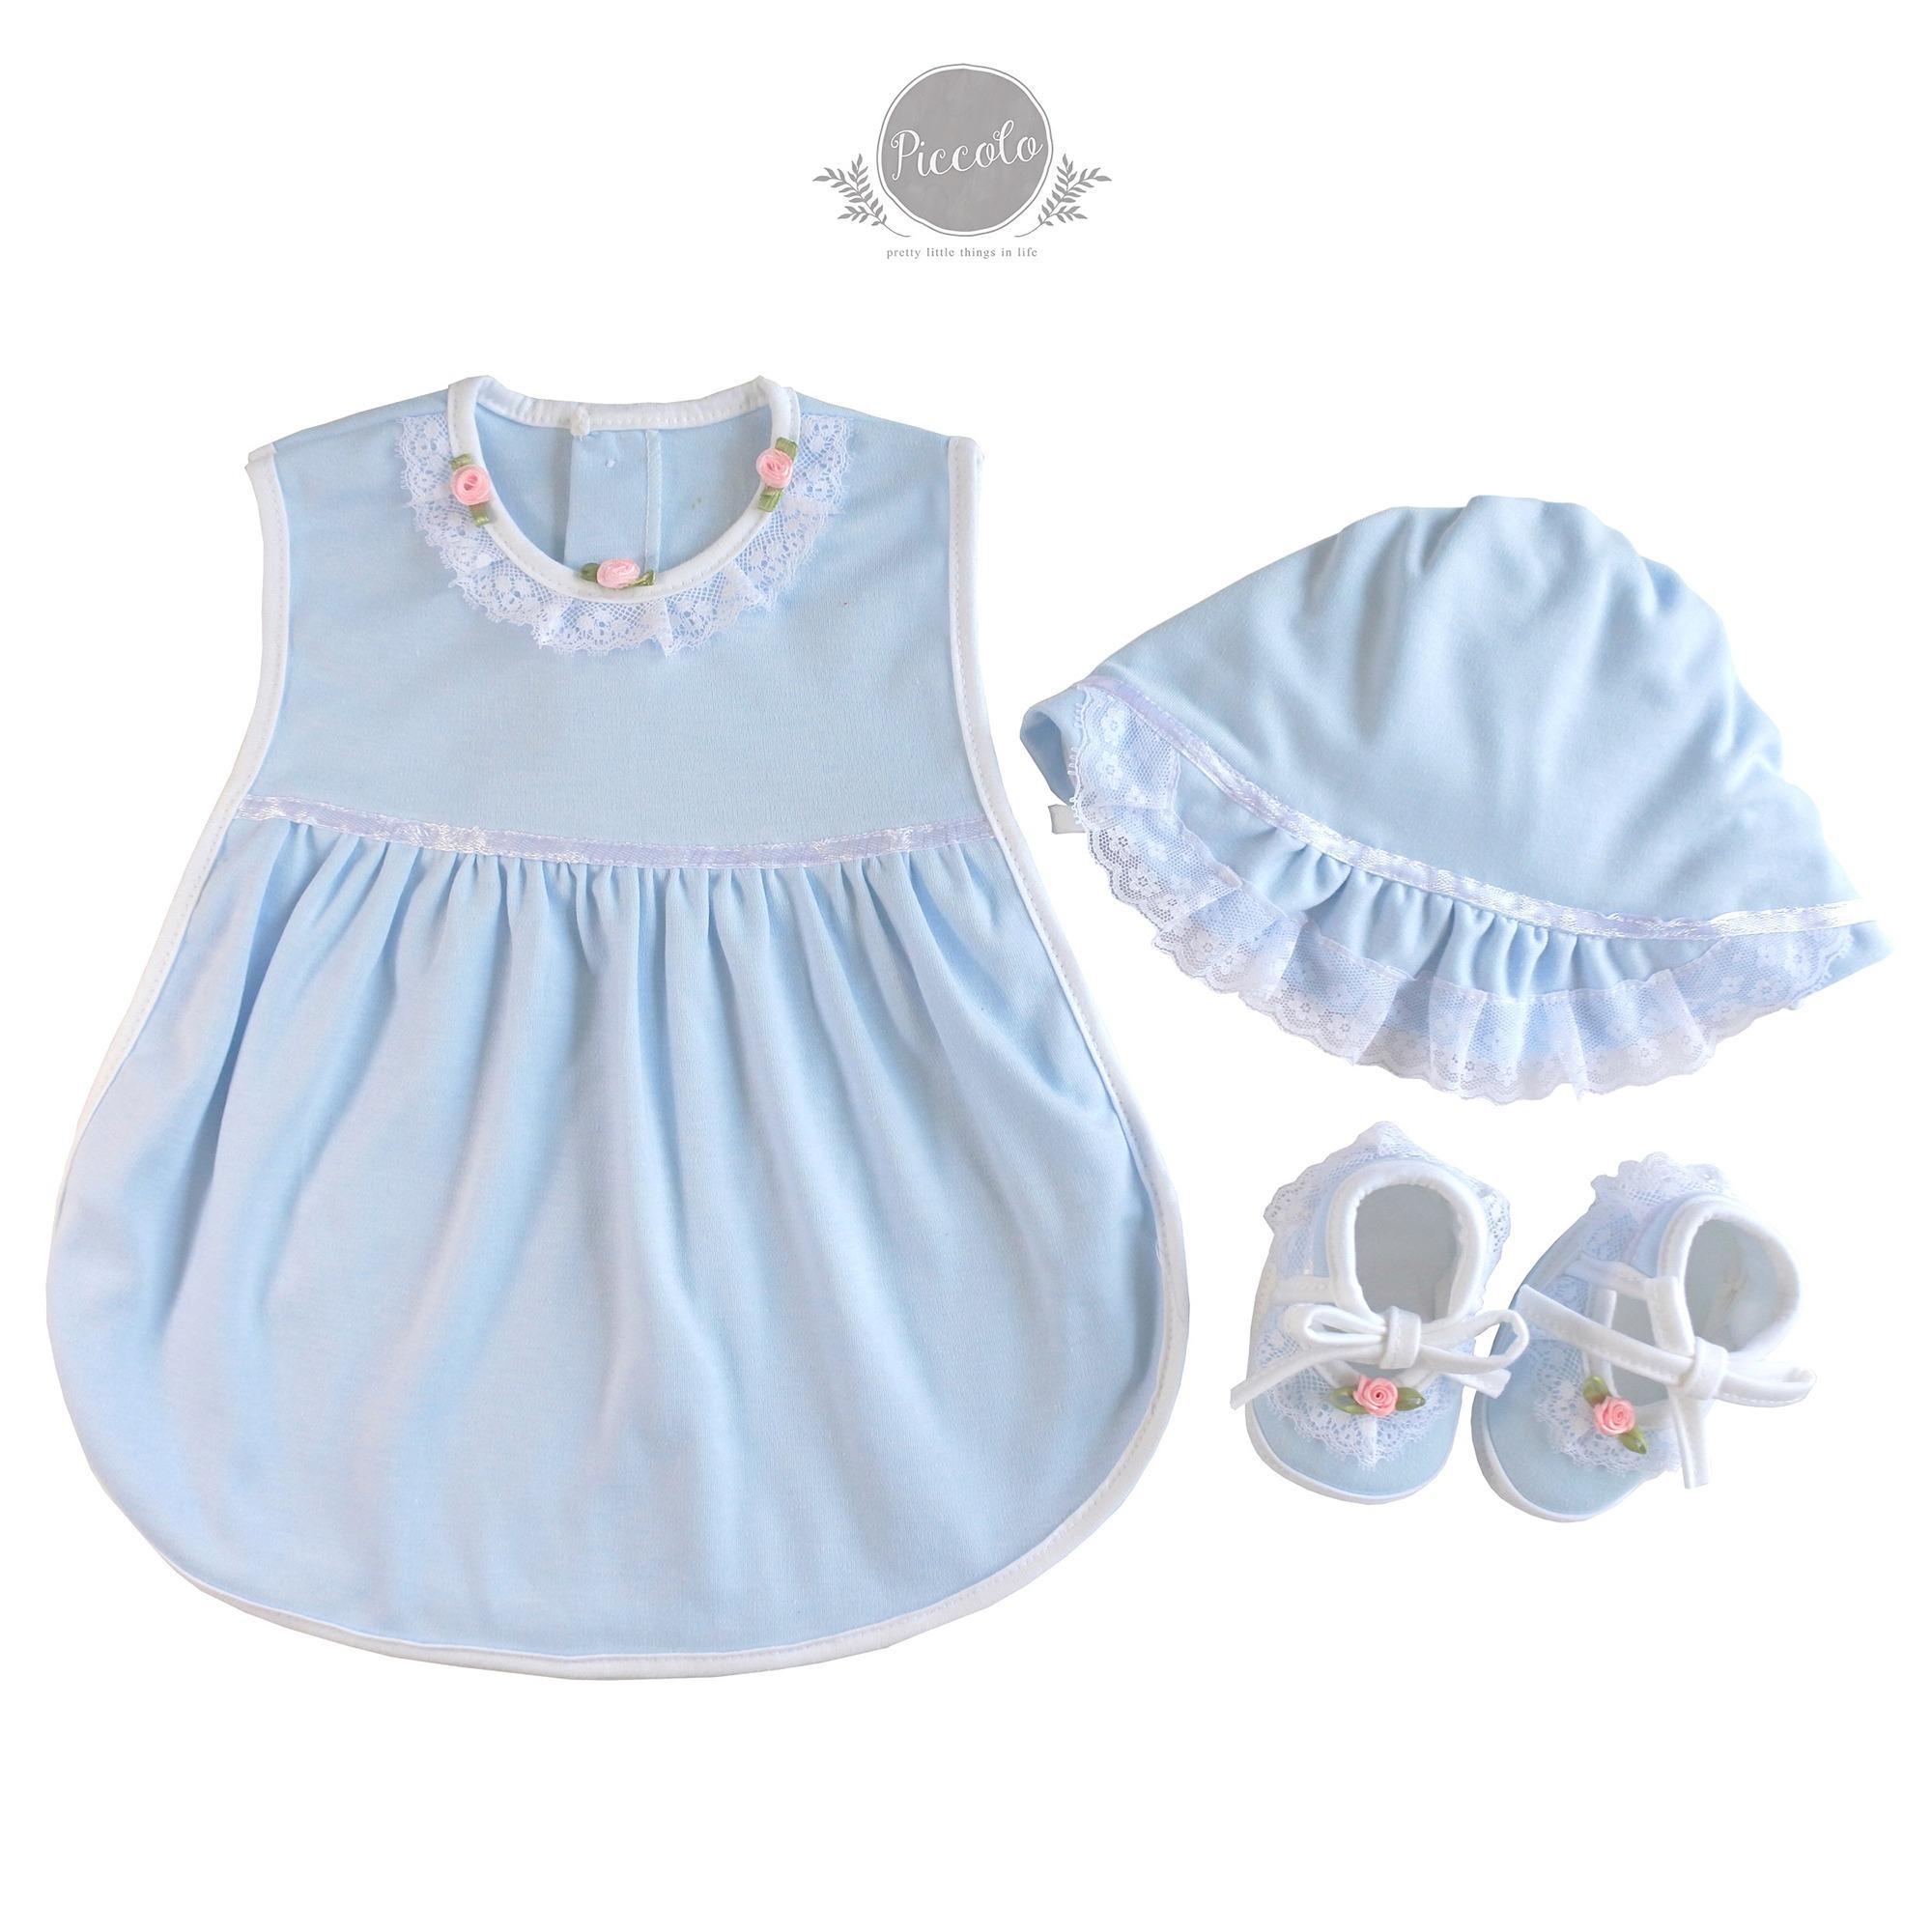 Features Dunia Anak Dot Buah Bayi Empeng Baby Fruit Perlengkapan Newborn Set Baju Perempuan Dress Kado Lahiran Aqiqah Nbsp